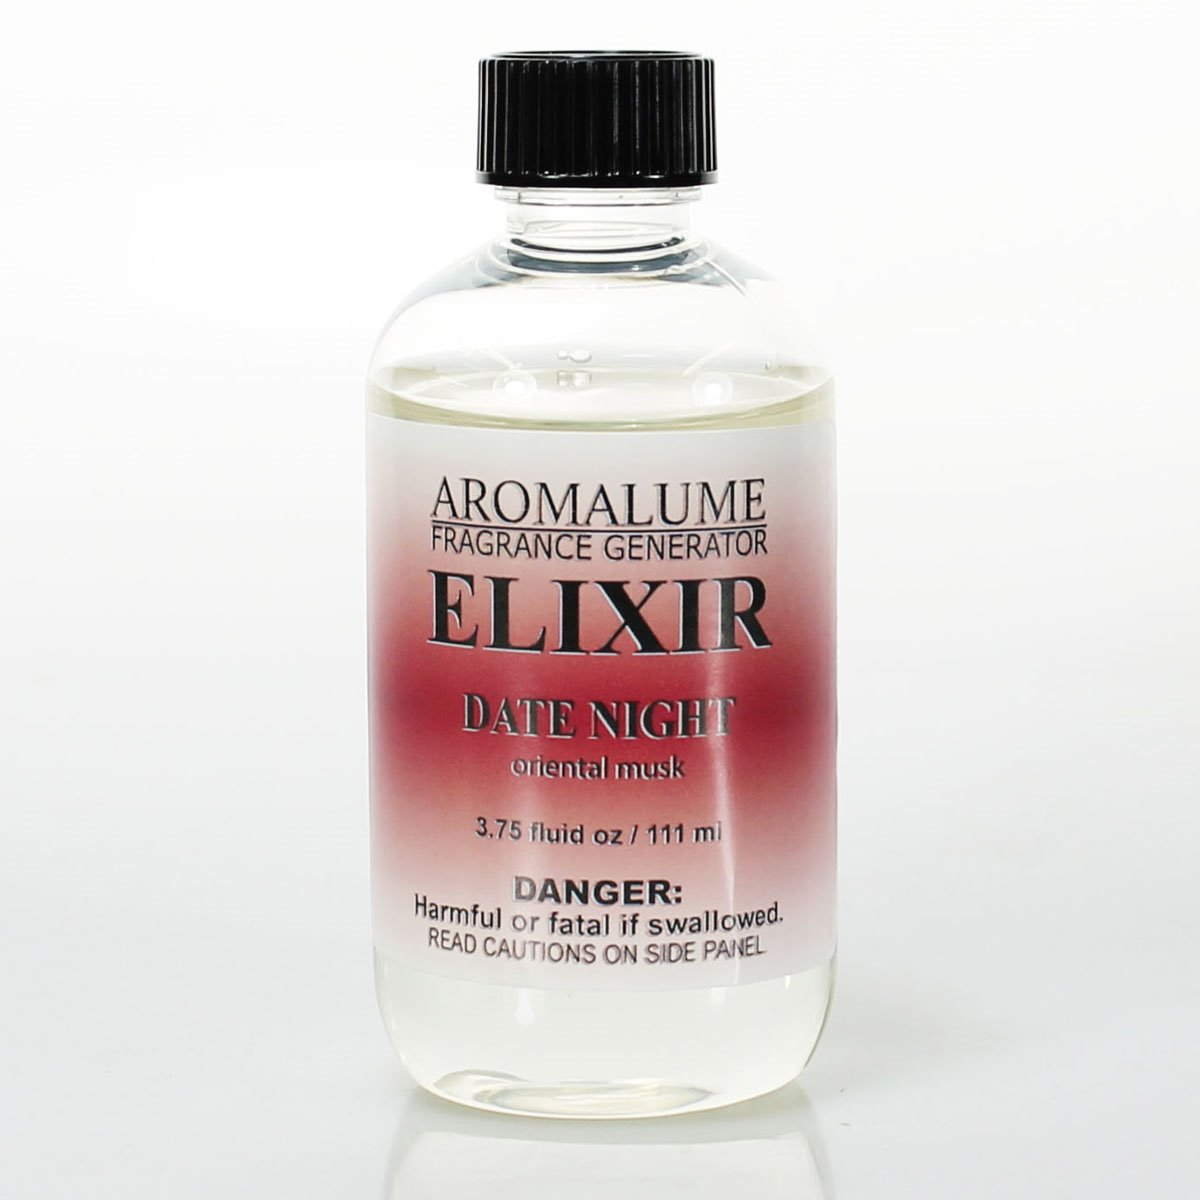 La Tee Da AromaLume Refill Elixir Fragrance Date Night